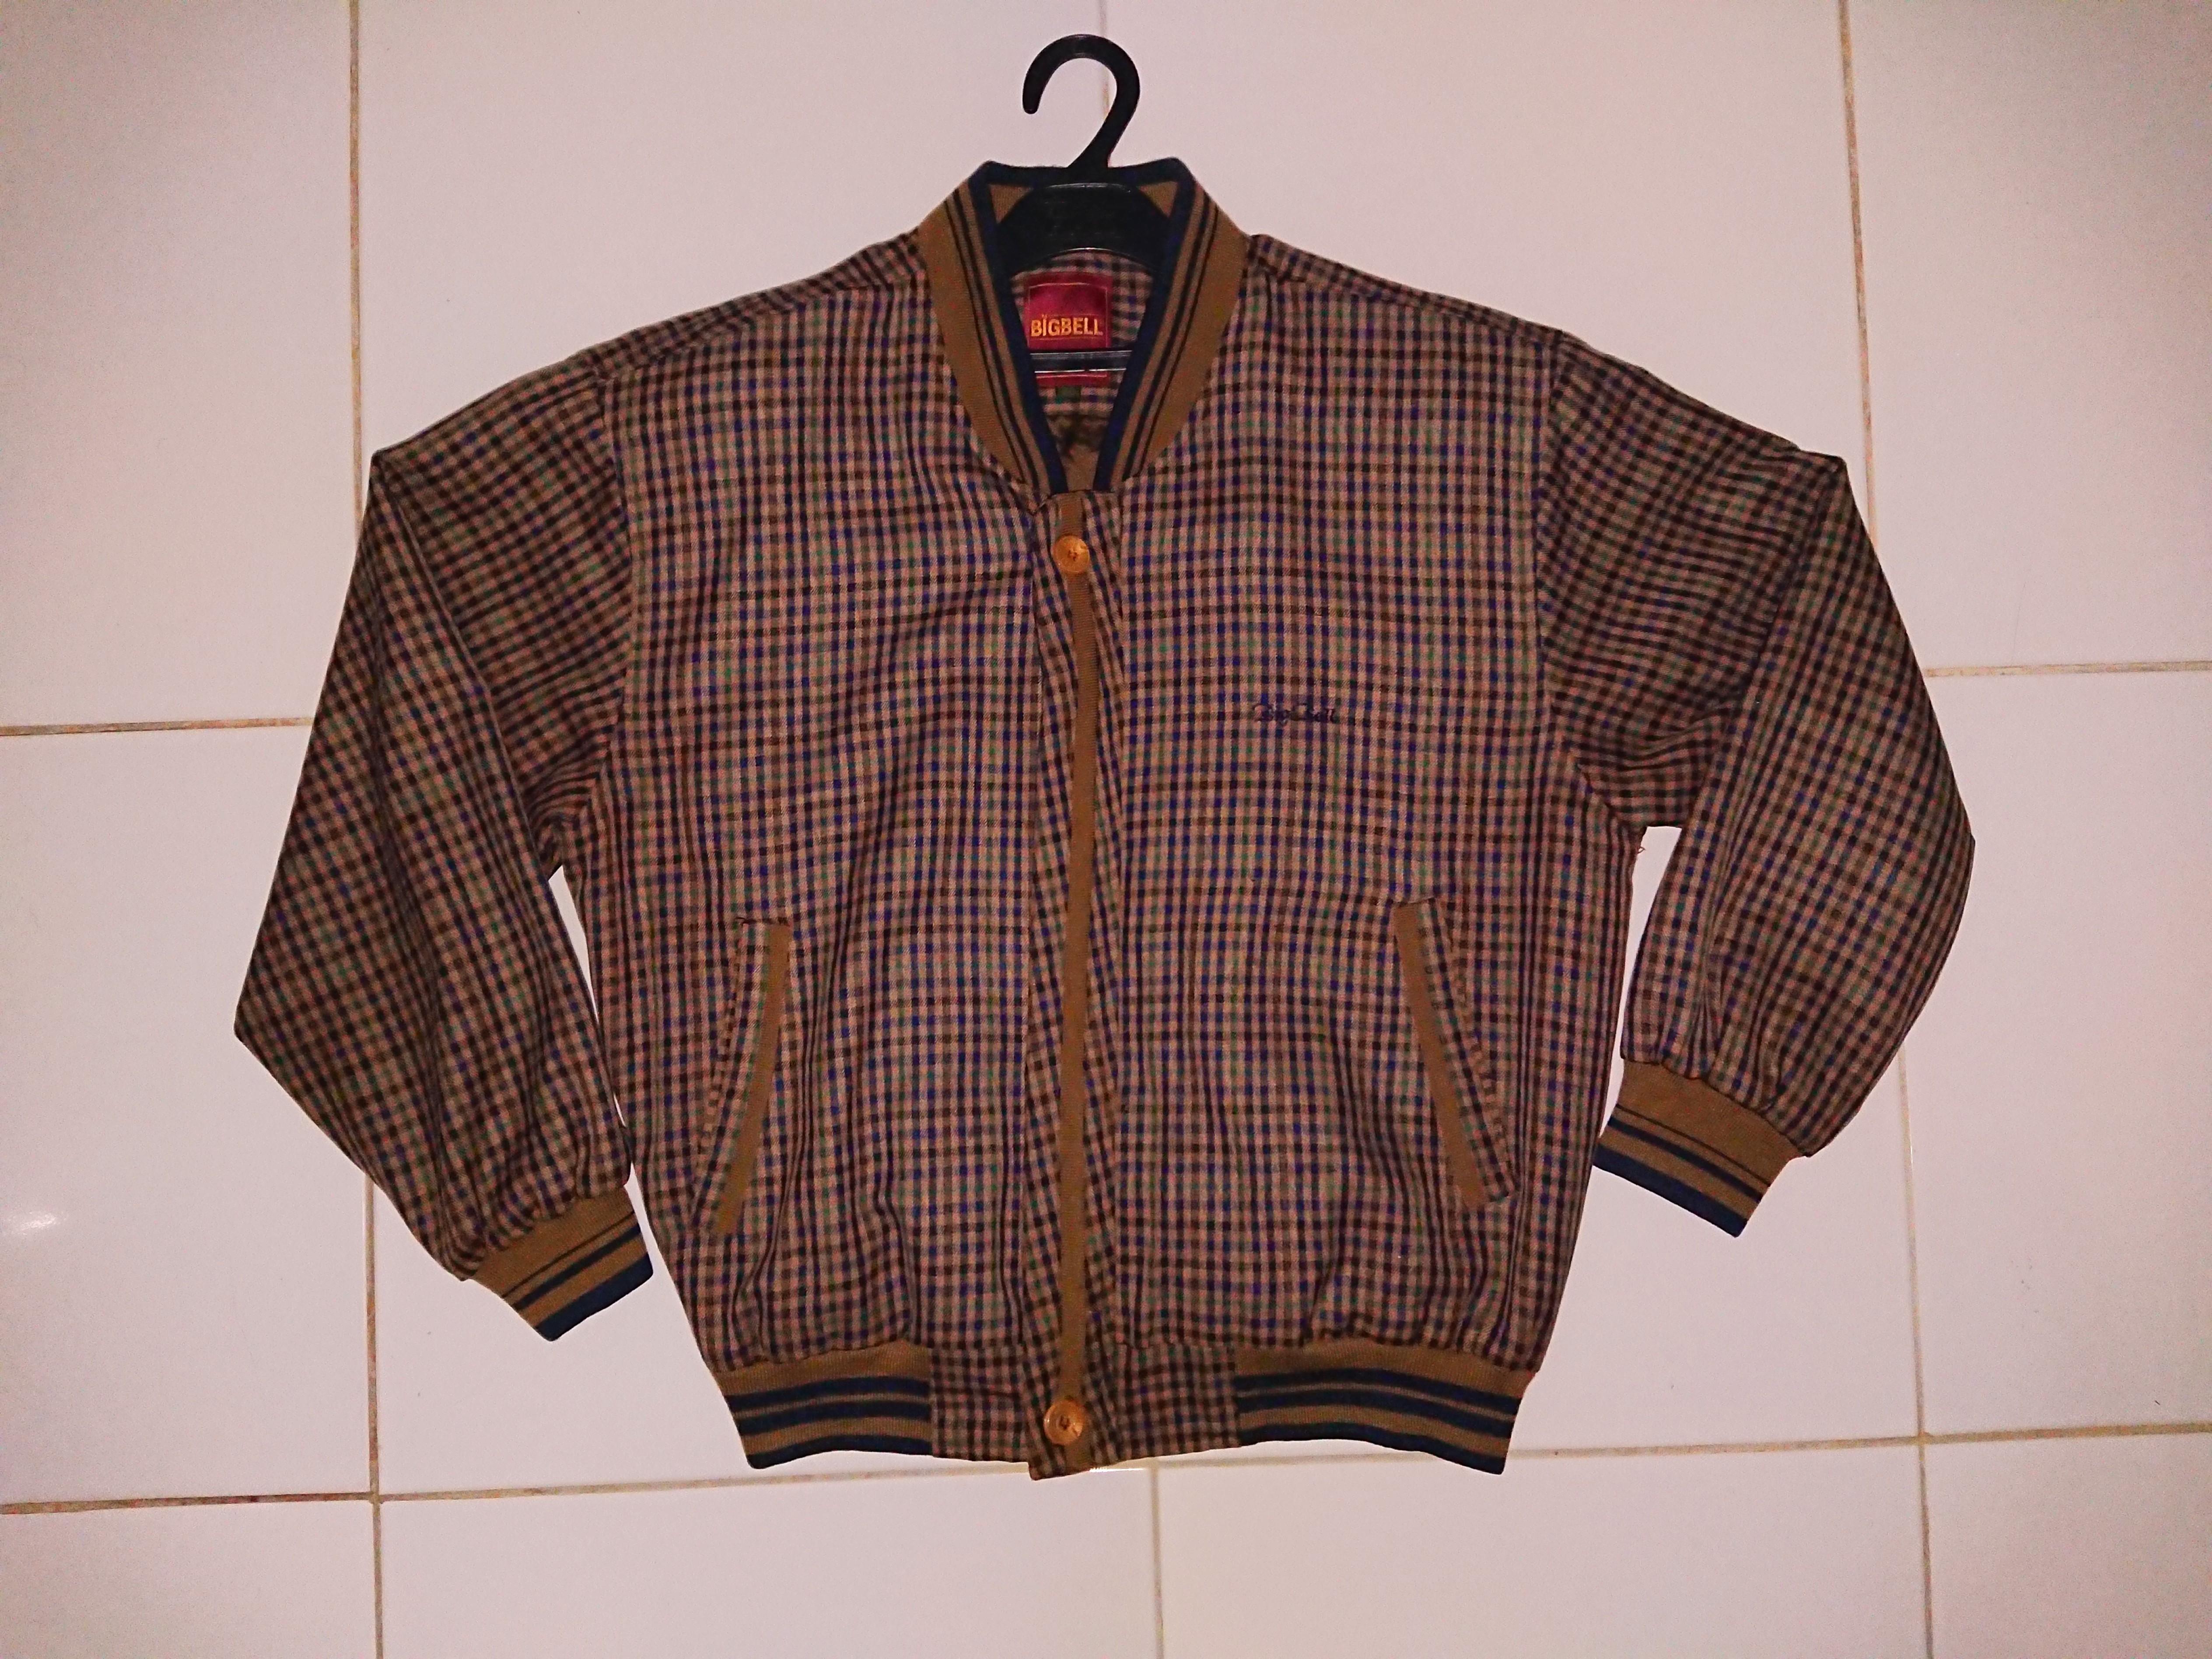 Bigbell Fashion Jacket